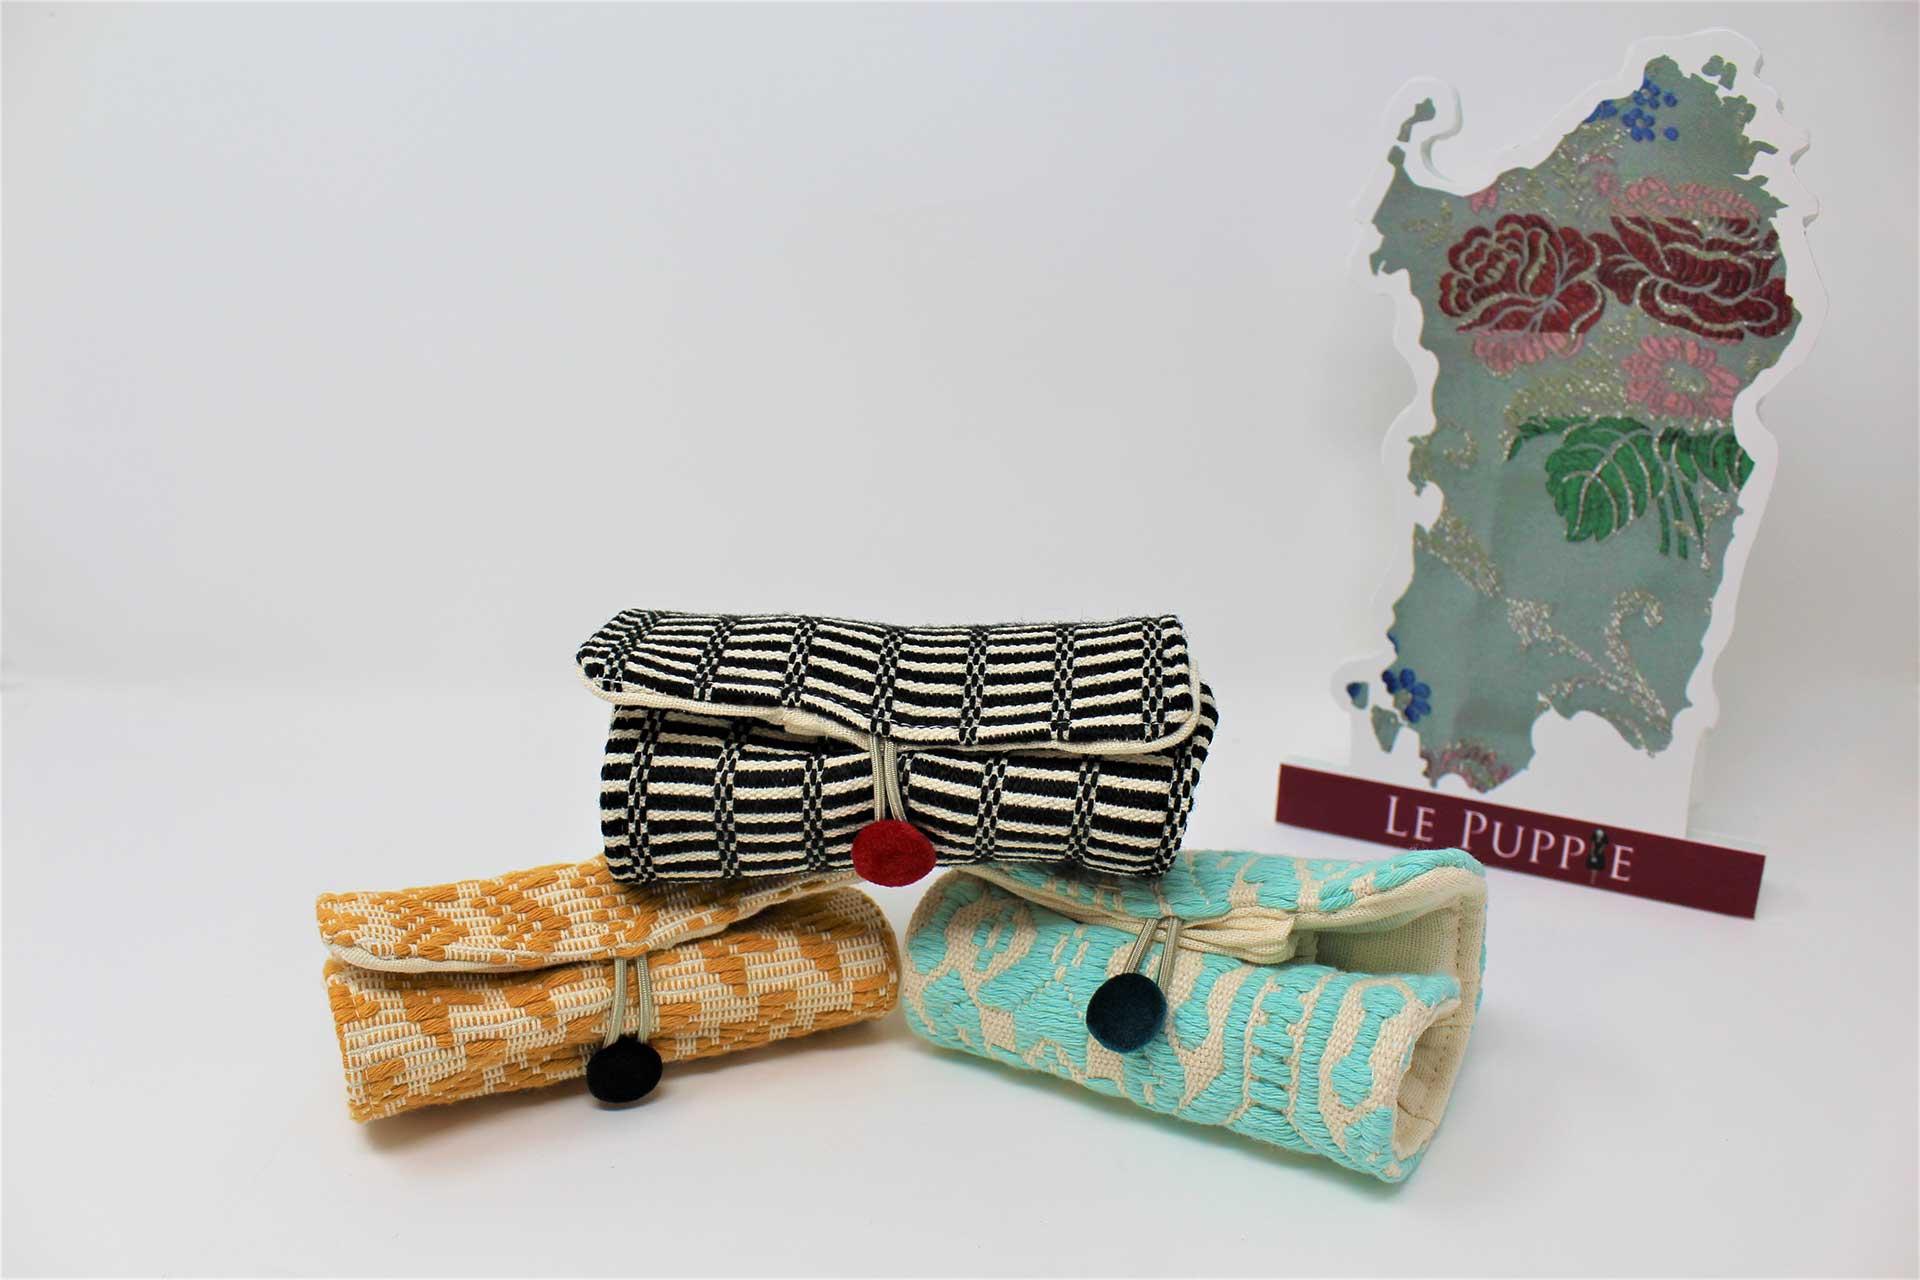 Debora Frau Artisan Products